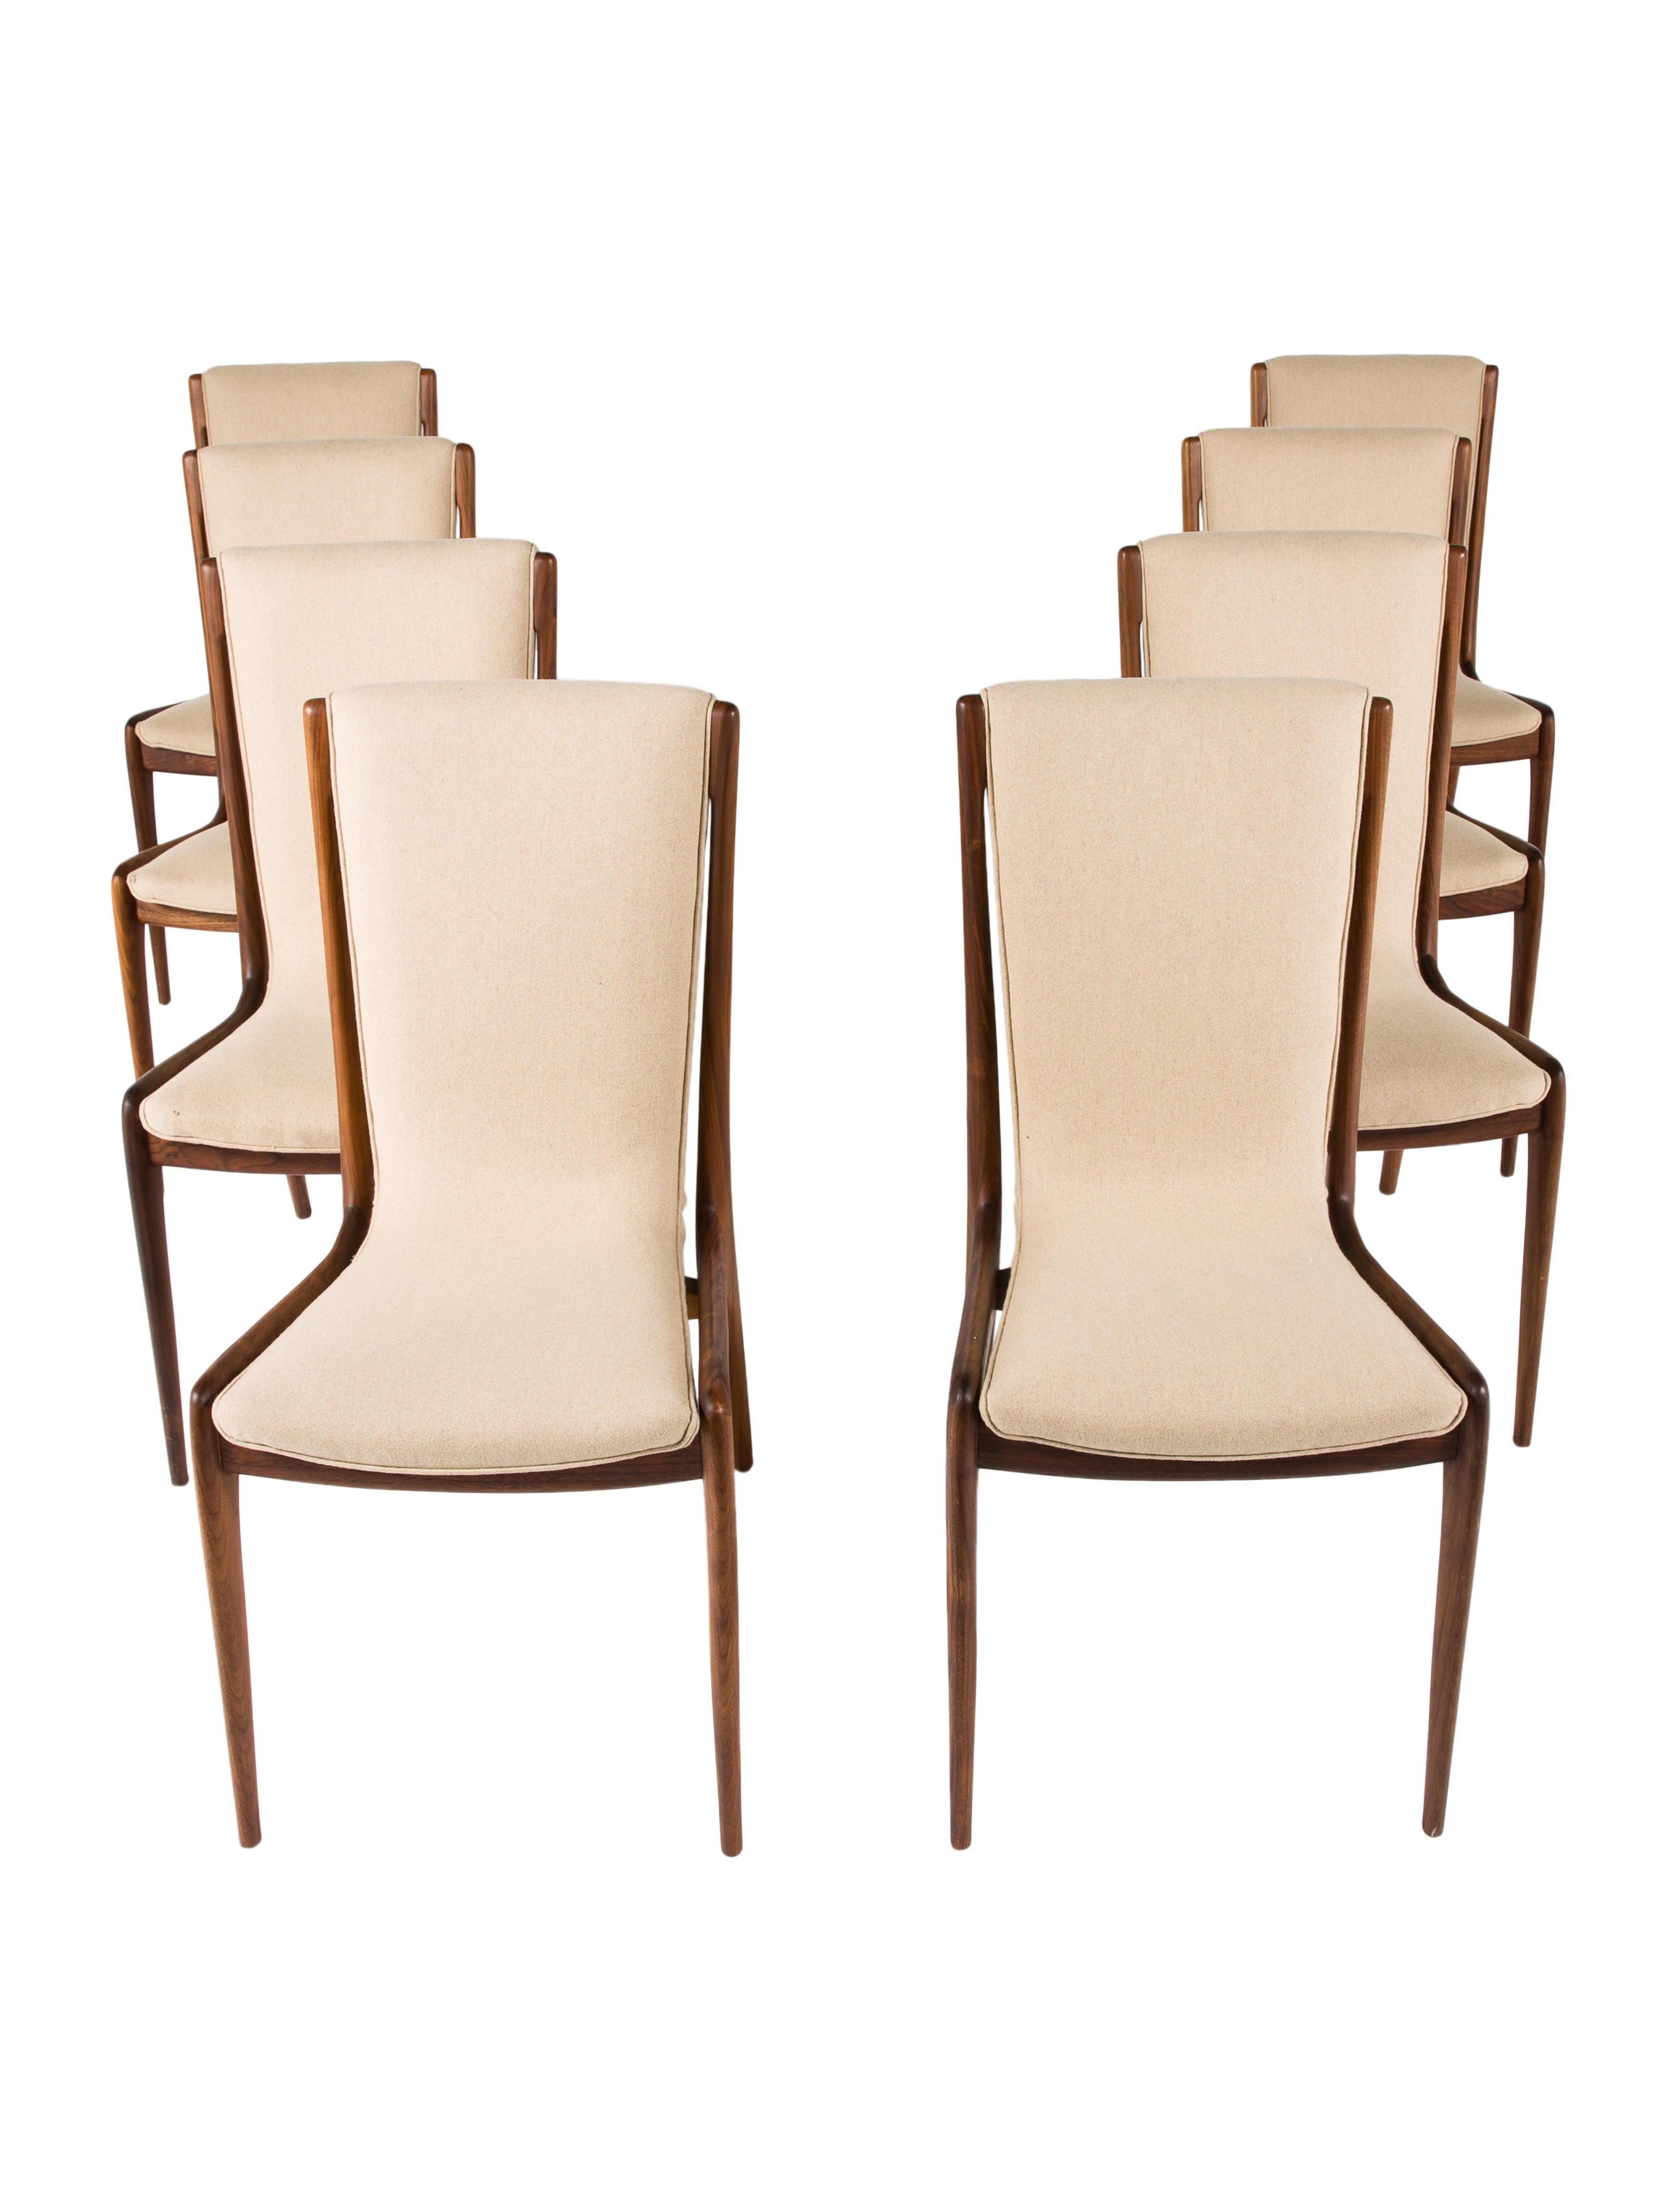 Vladimir Kagan Sculpted Sling Side Chairs